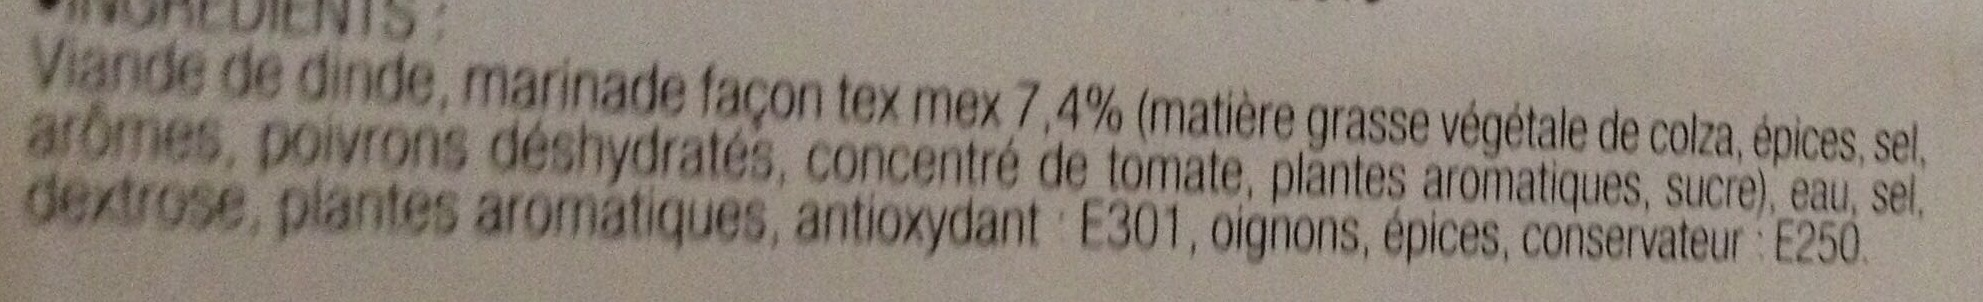 Médaillons de dinde marinés Tex-Mex Précuits - Ingrediënten - fr